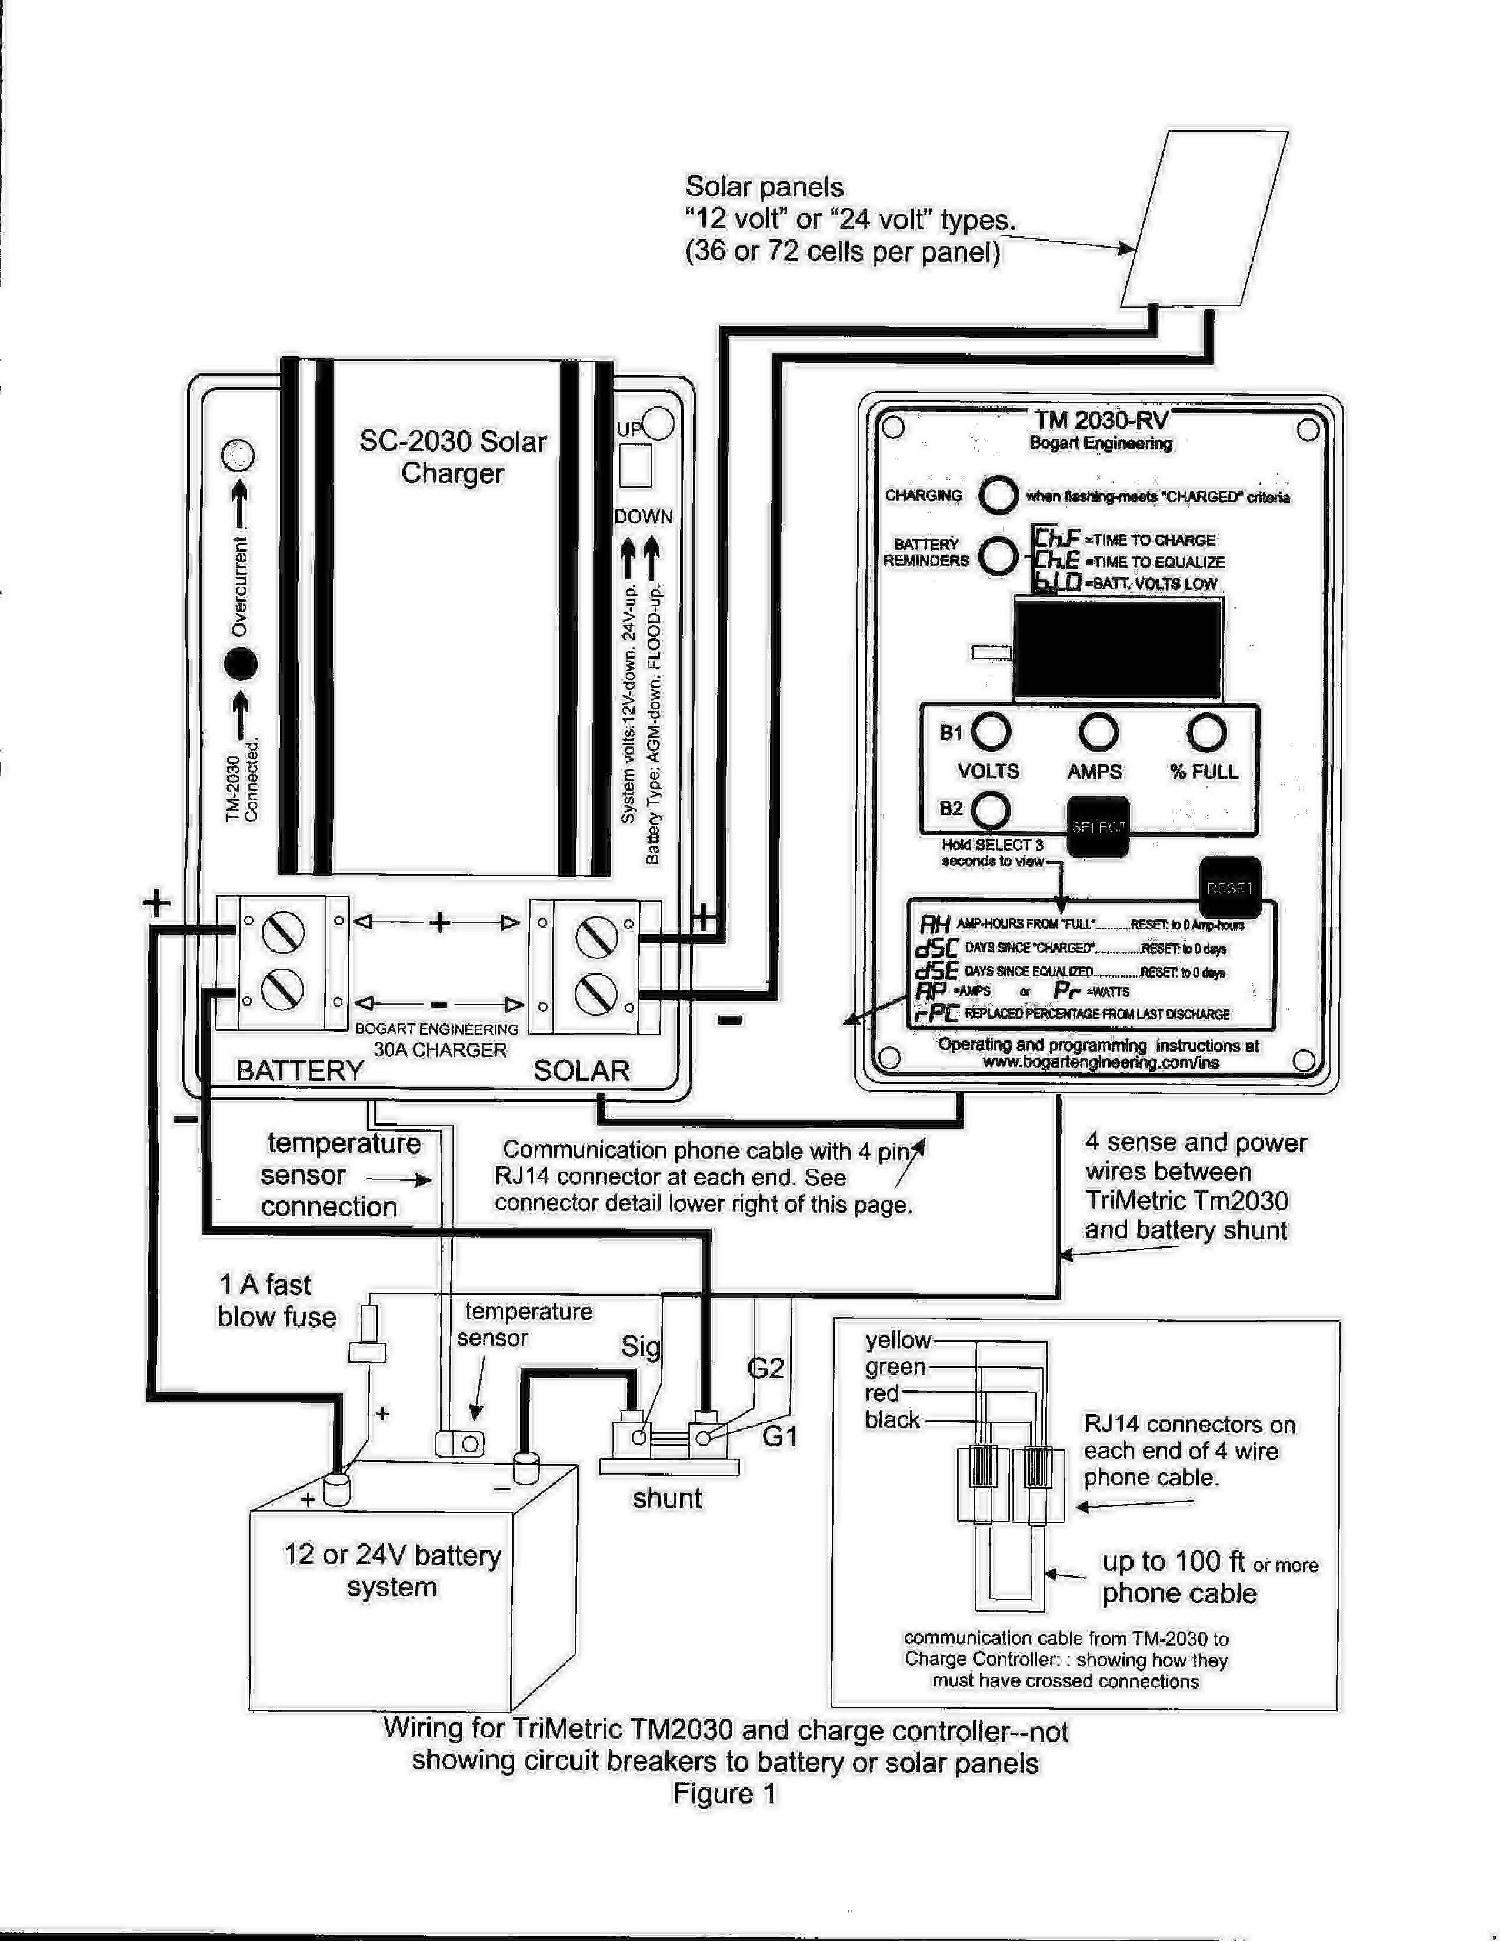 iota i320 emergency ballast wiring diagram 2008 nissan xterra radio 81 trimetric 2030 and sc layout